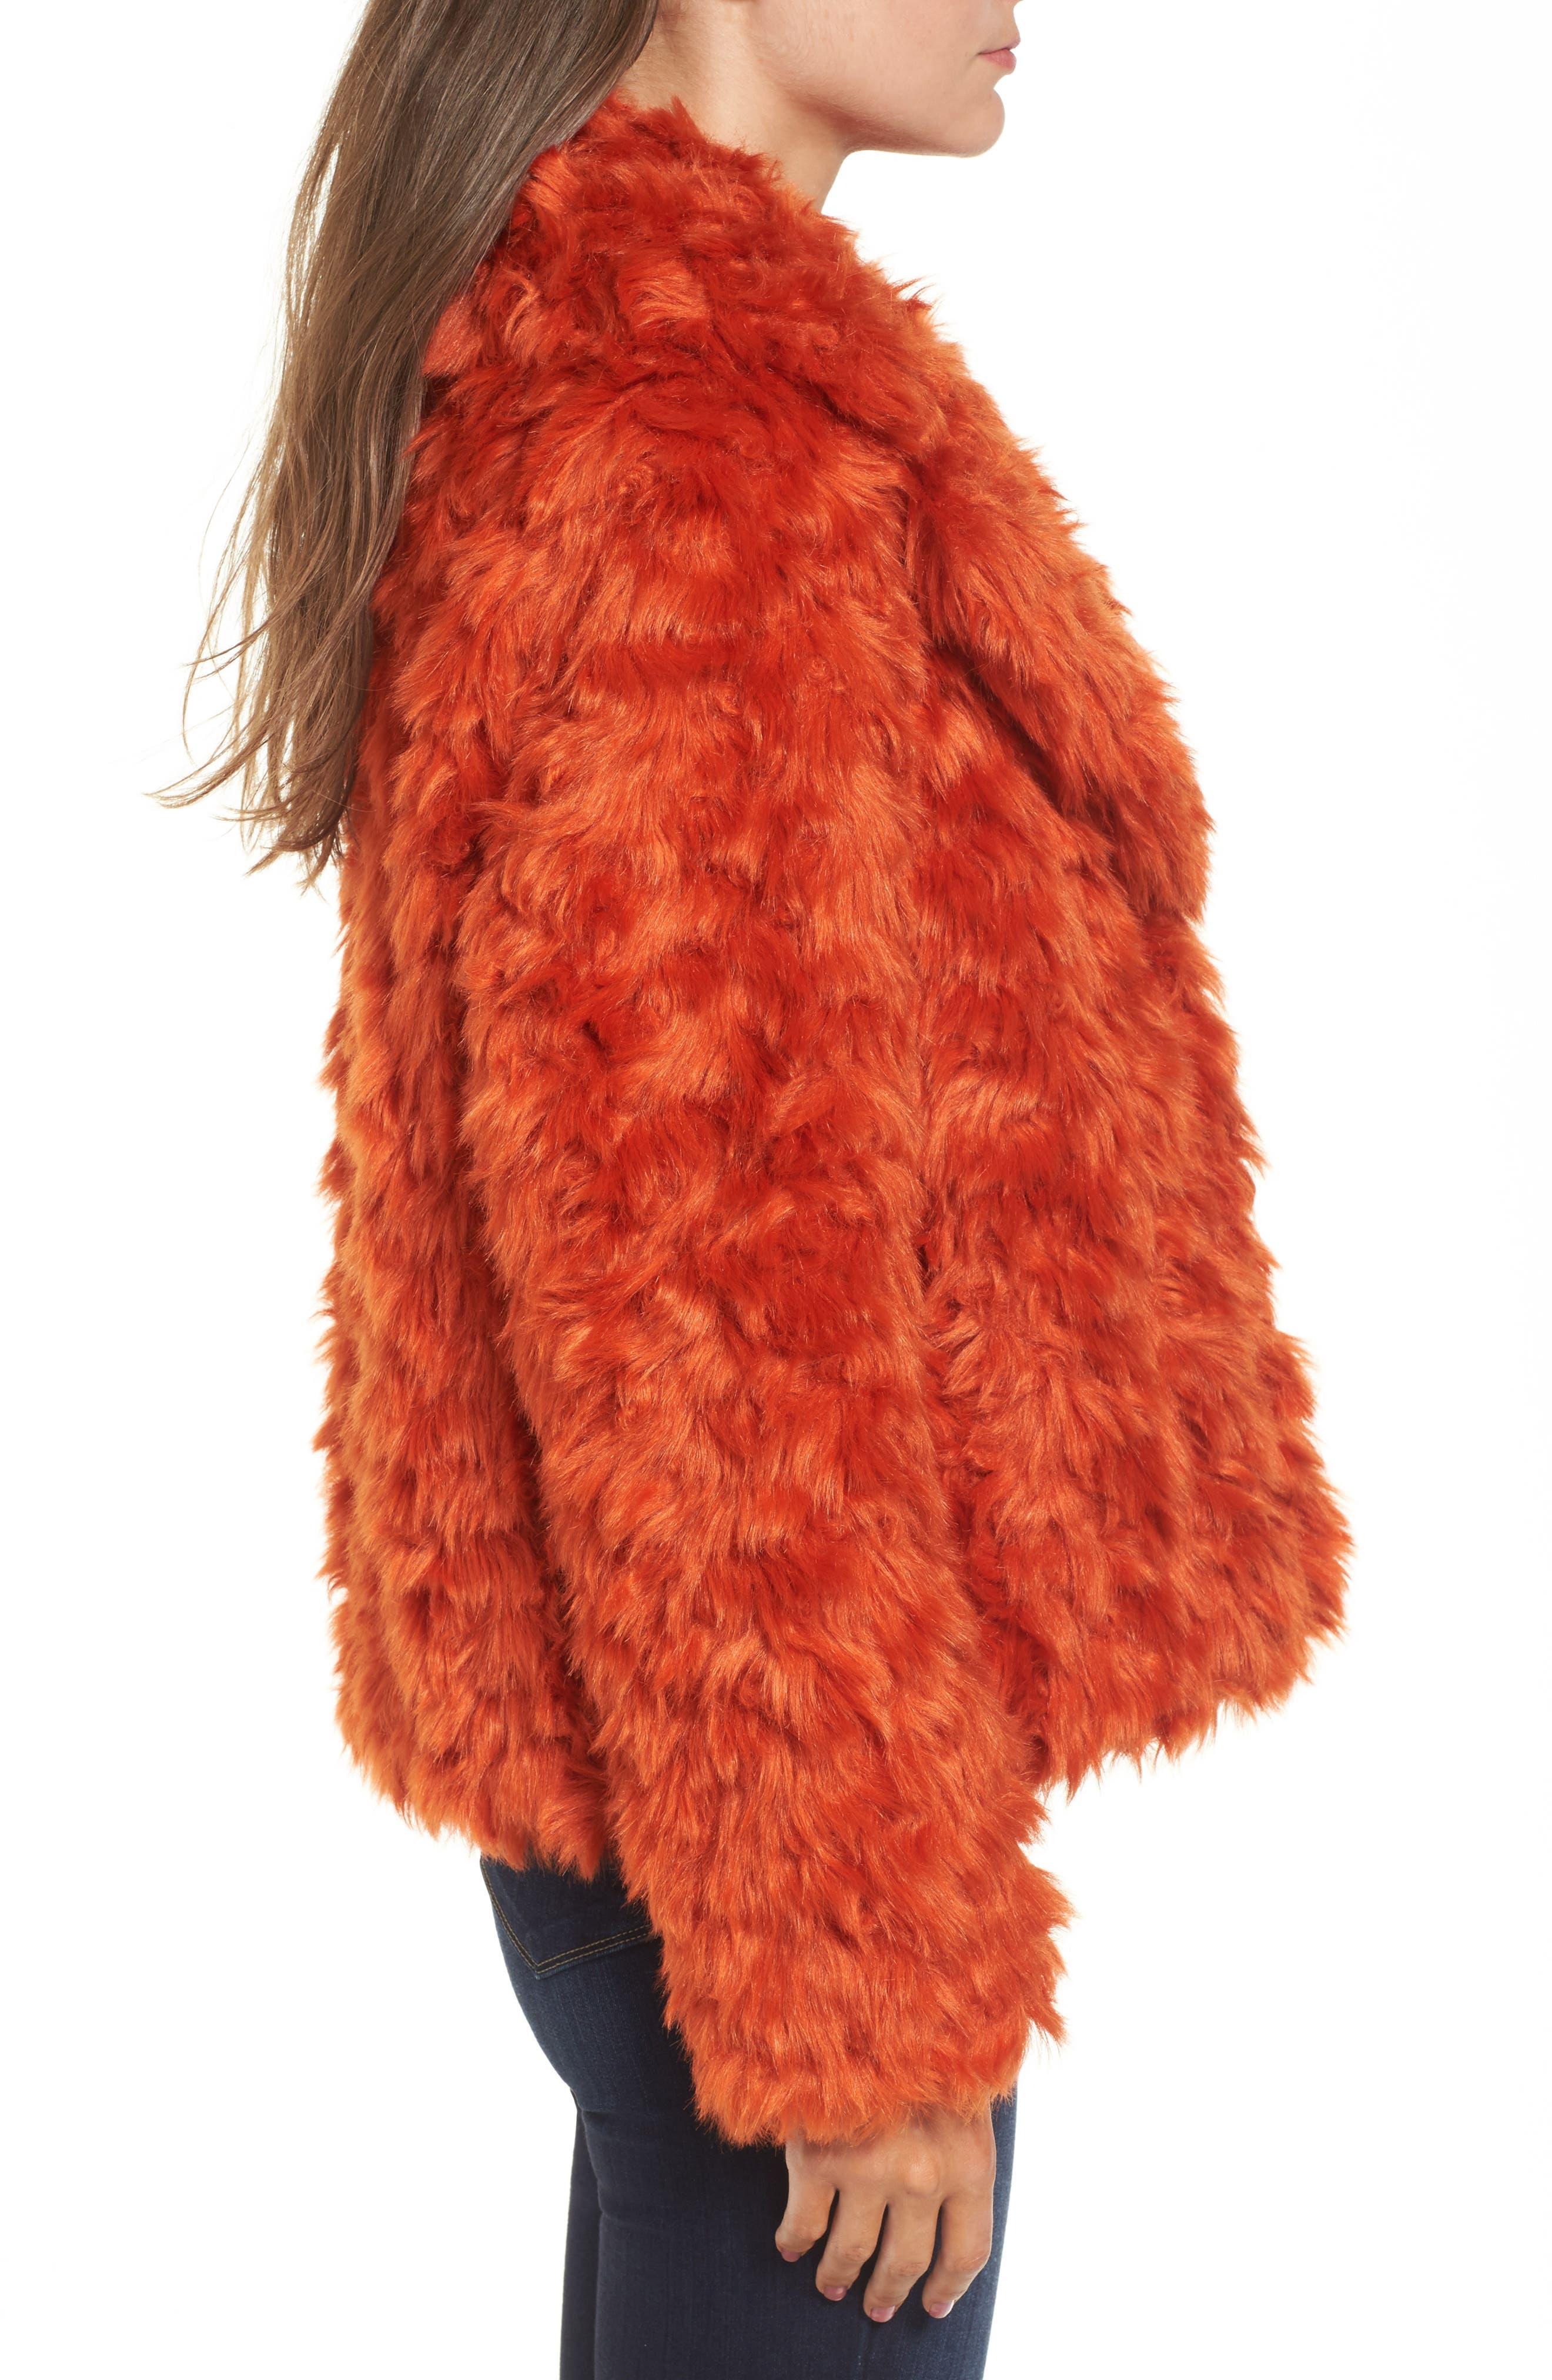 Curly Faux Fur Jacket,                             Alternate thumbnail 3, color,                             800